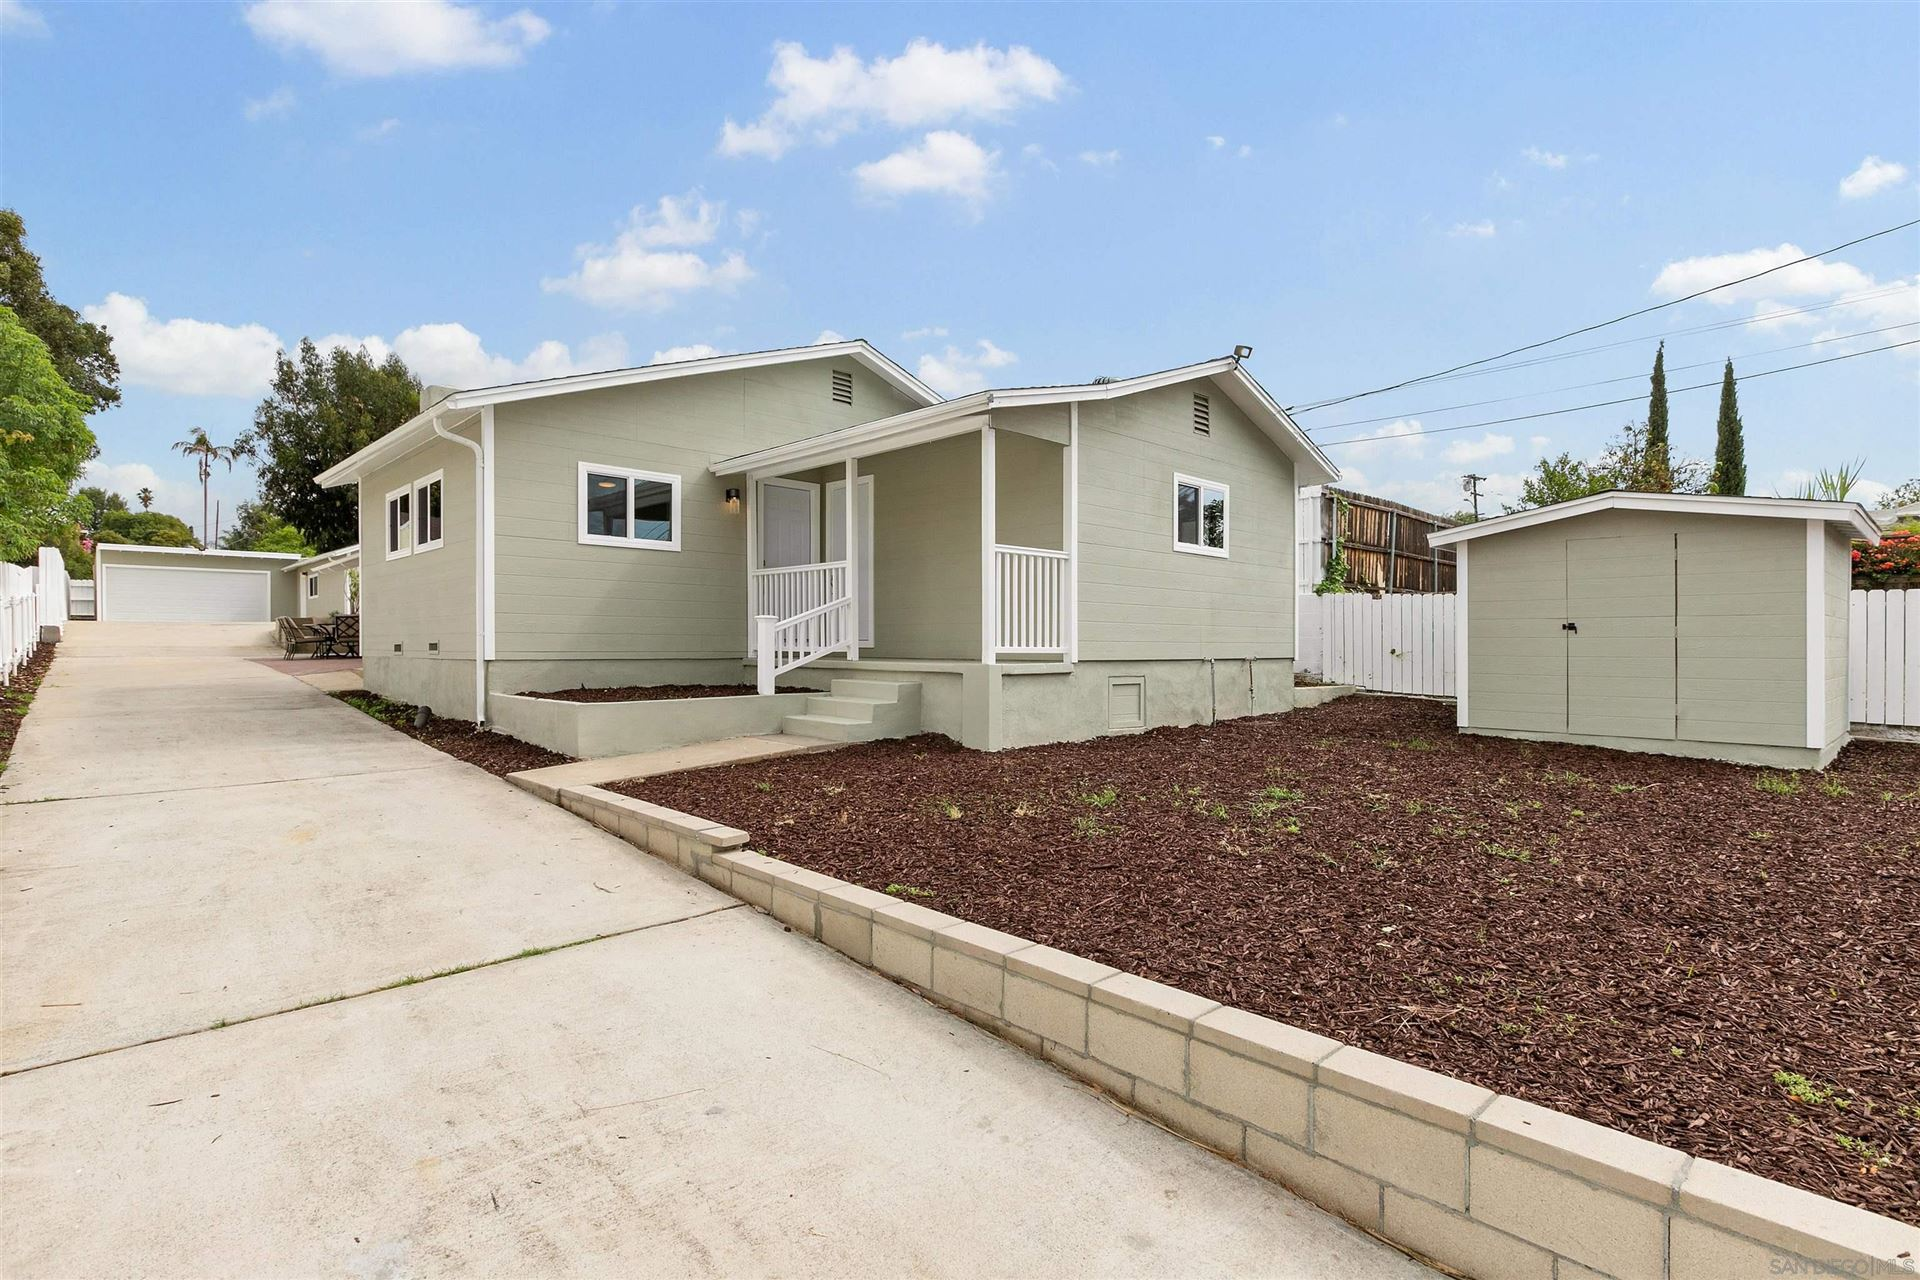 Photo of 4807 Parks Ave, La Mesa, CA 91942 (MLS # 210028391)